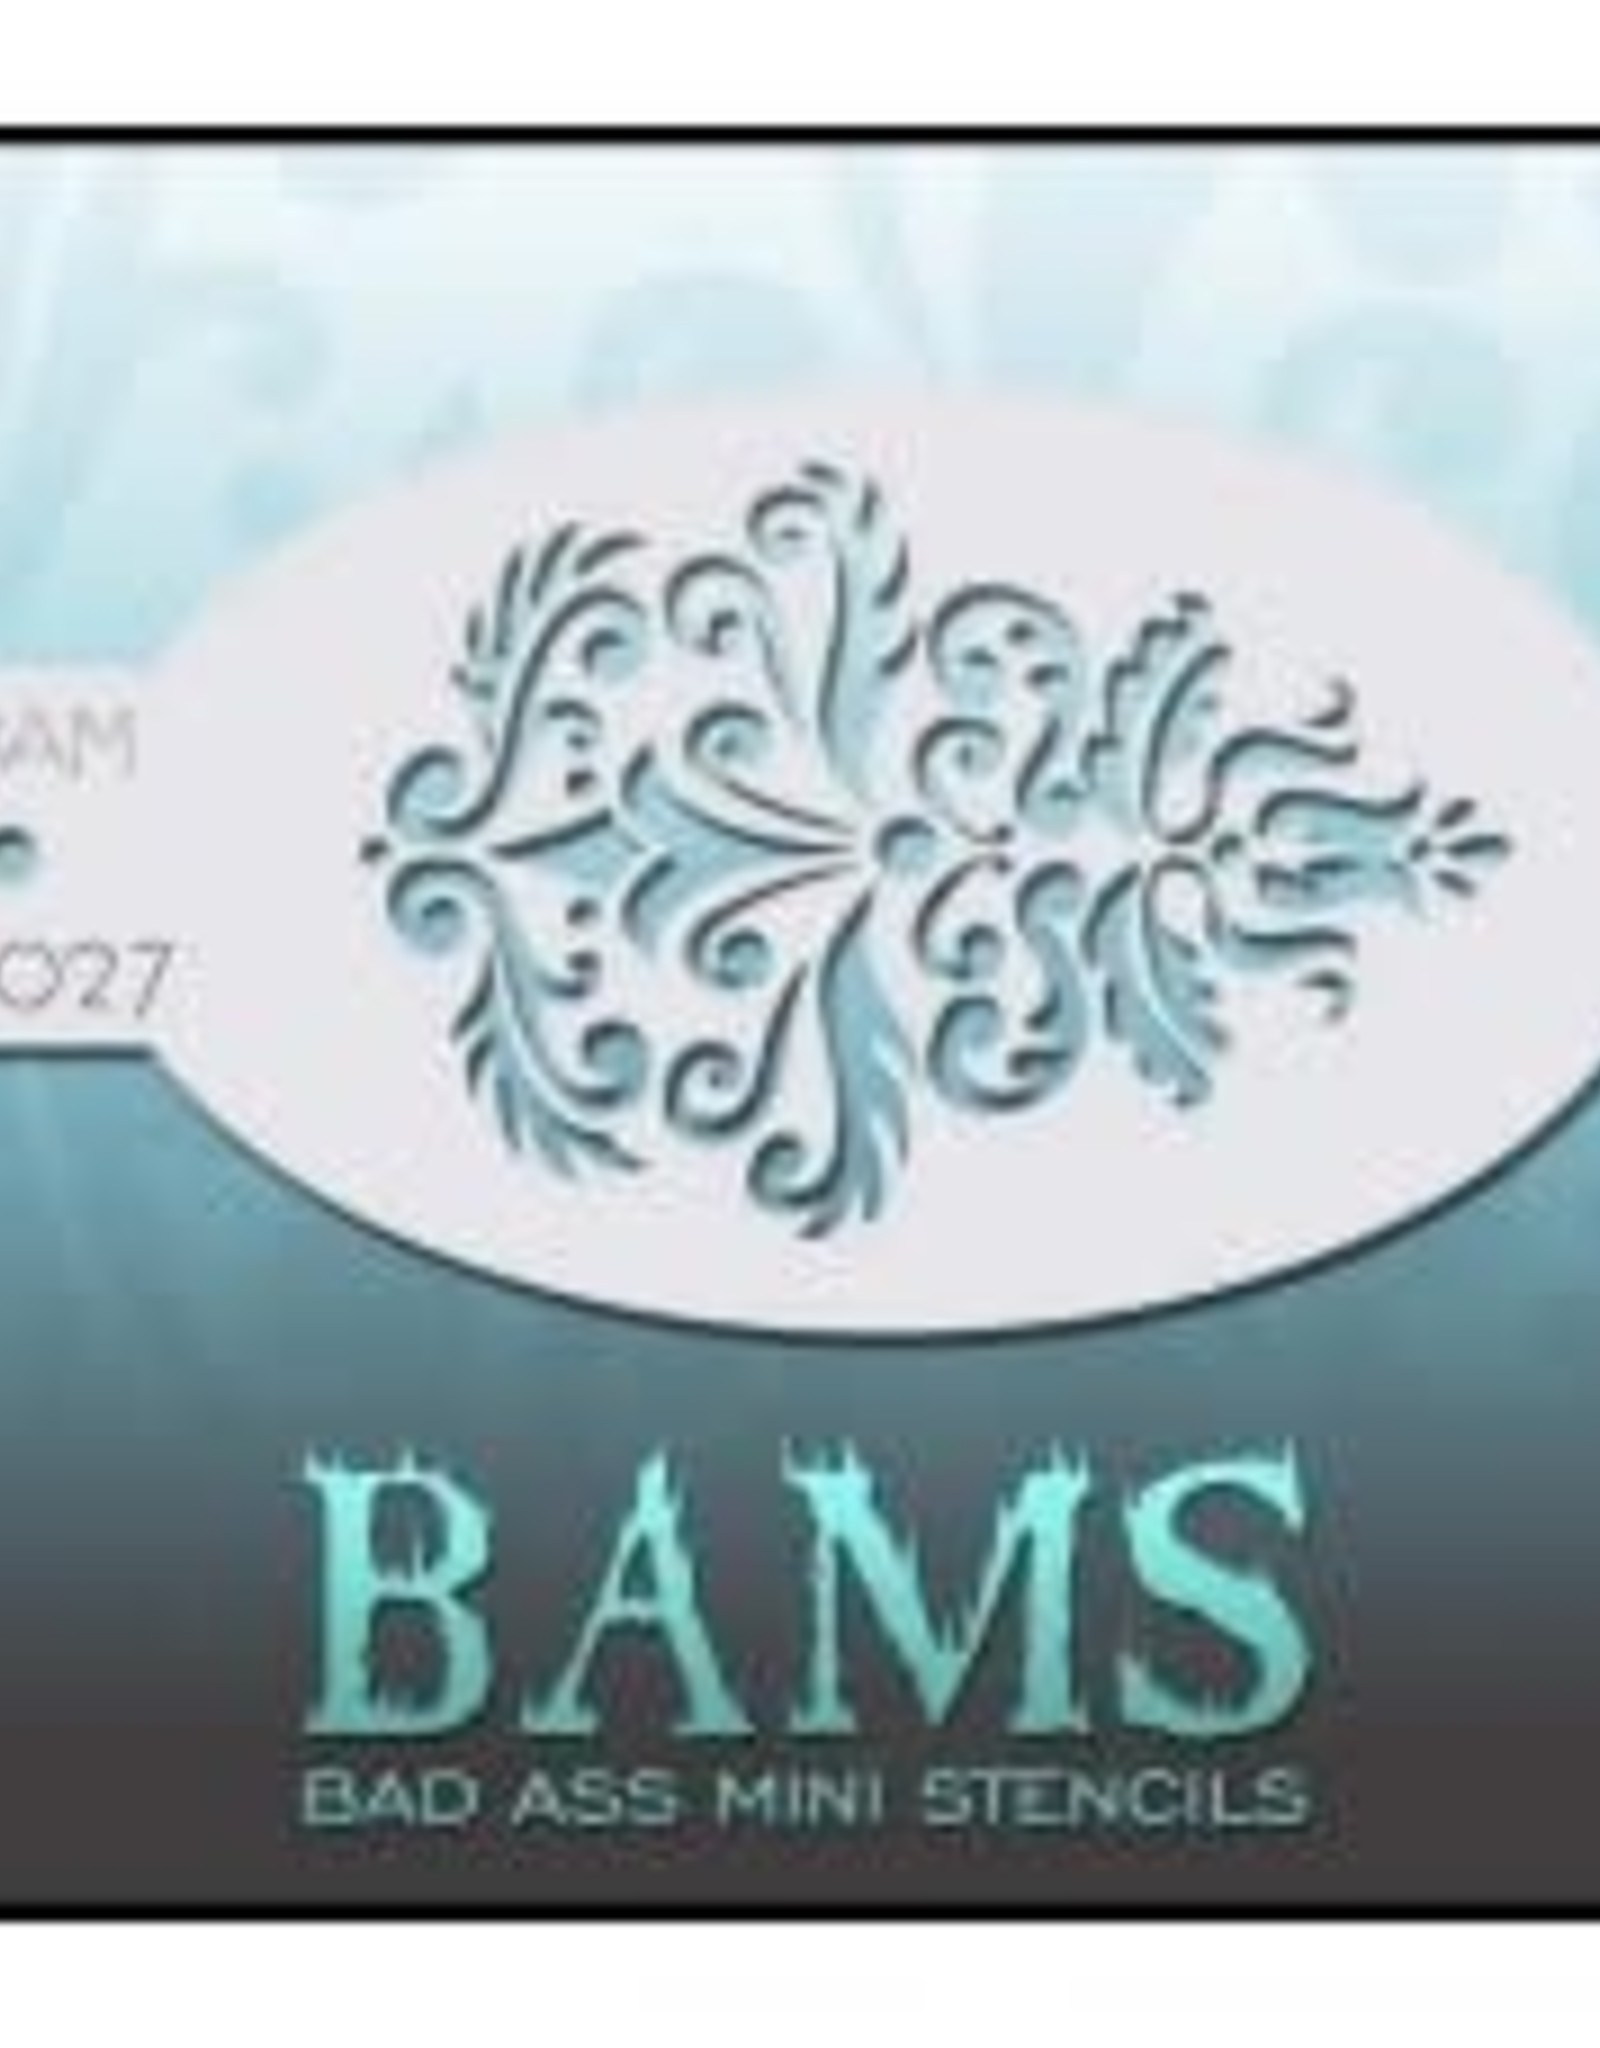 Bad Ass Stencils Bad Ass Mini Stencil - BAM2027